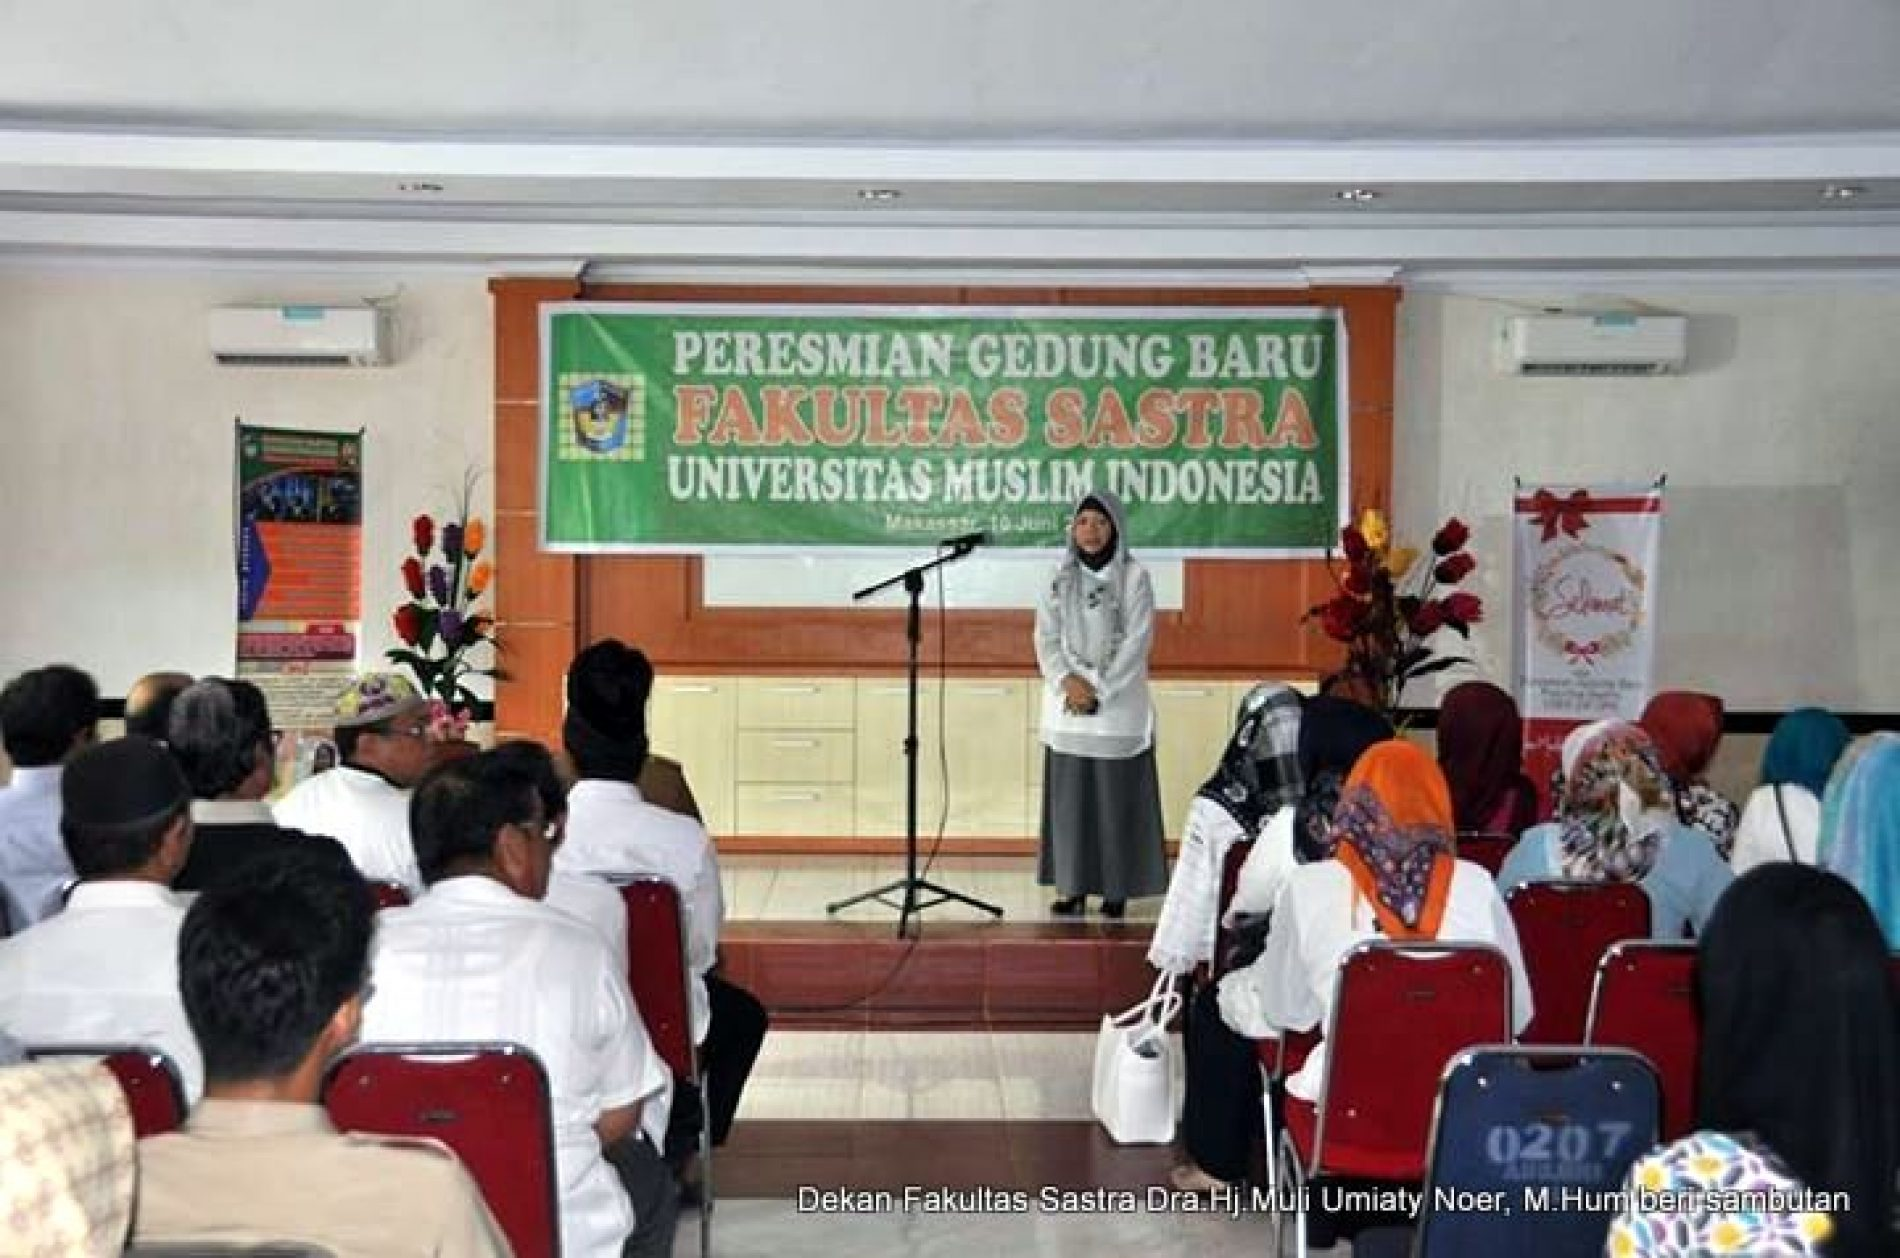 Foto: Peresmian Gedung Baru Fakultas Sastra UMI